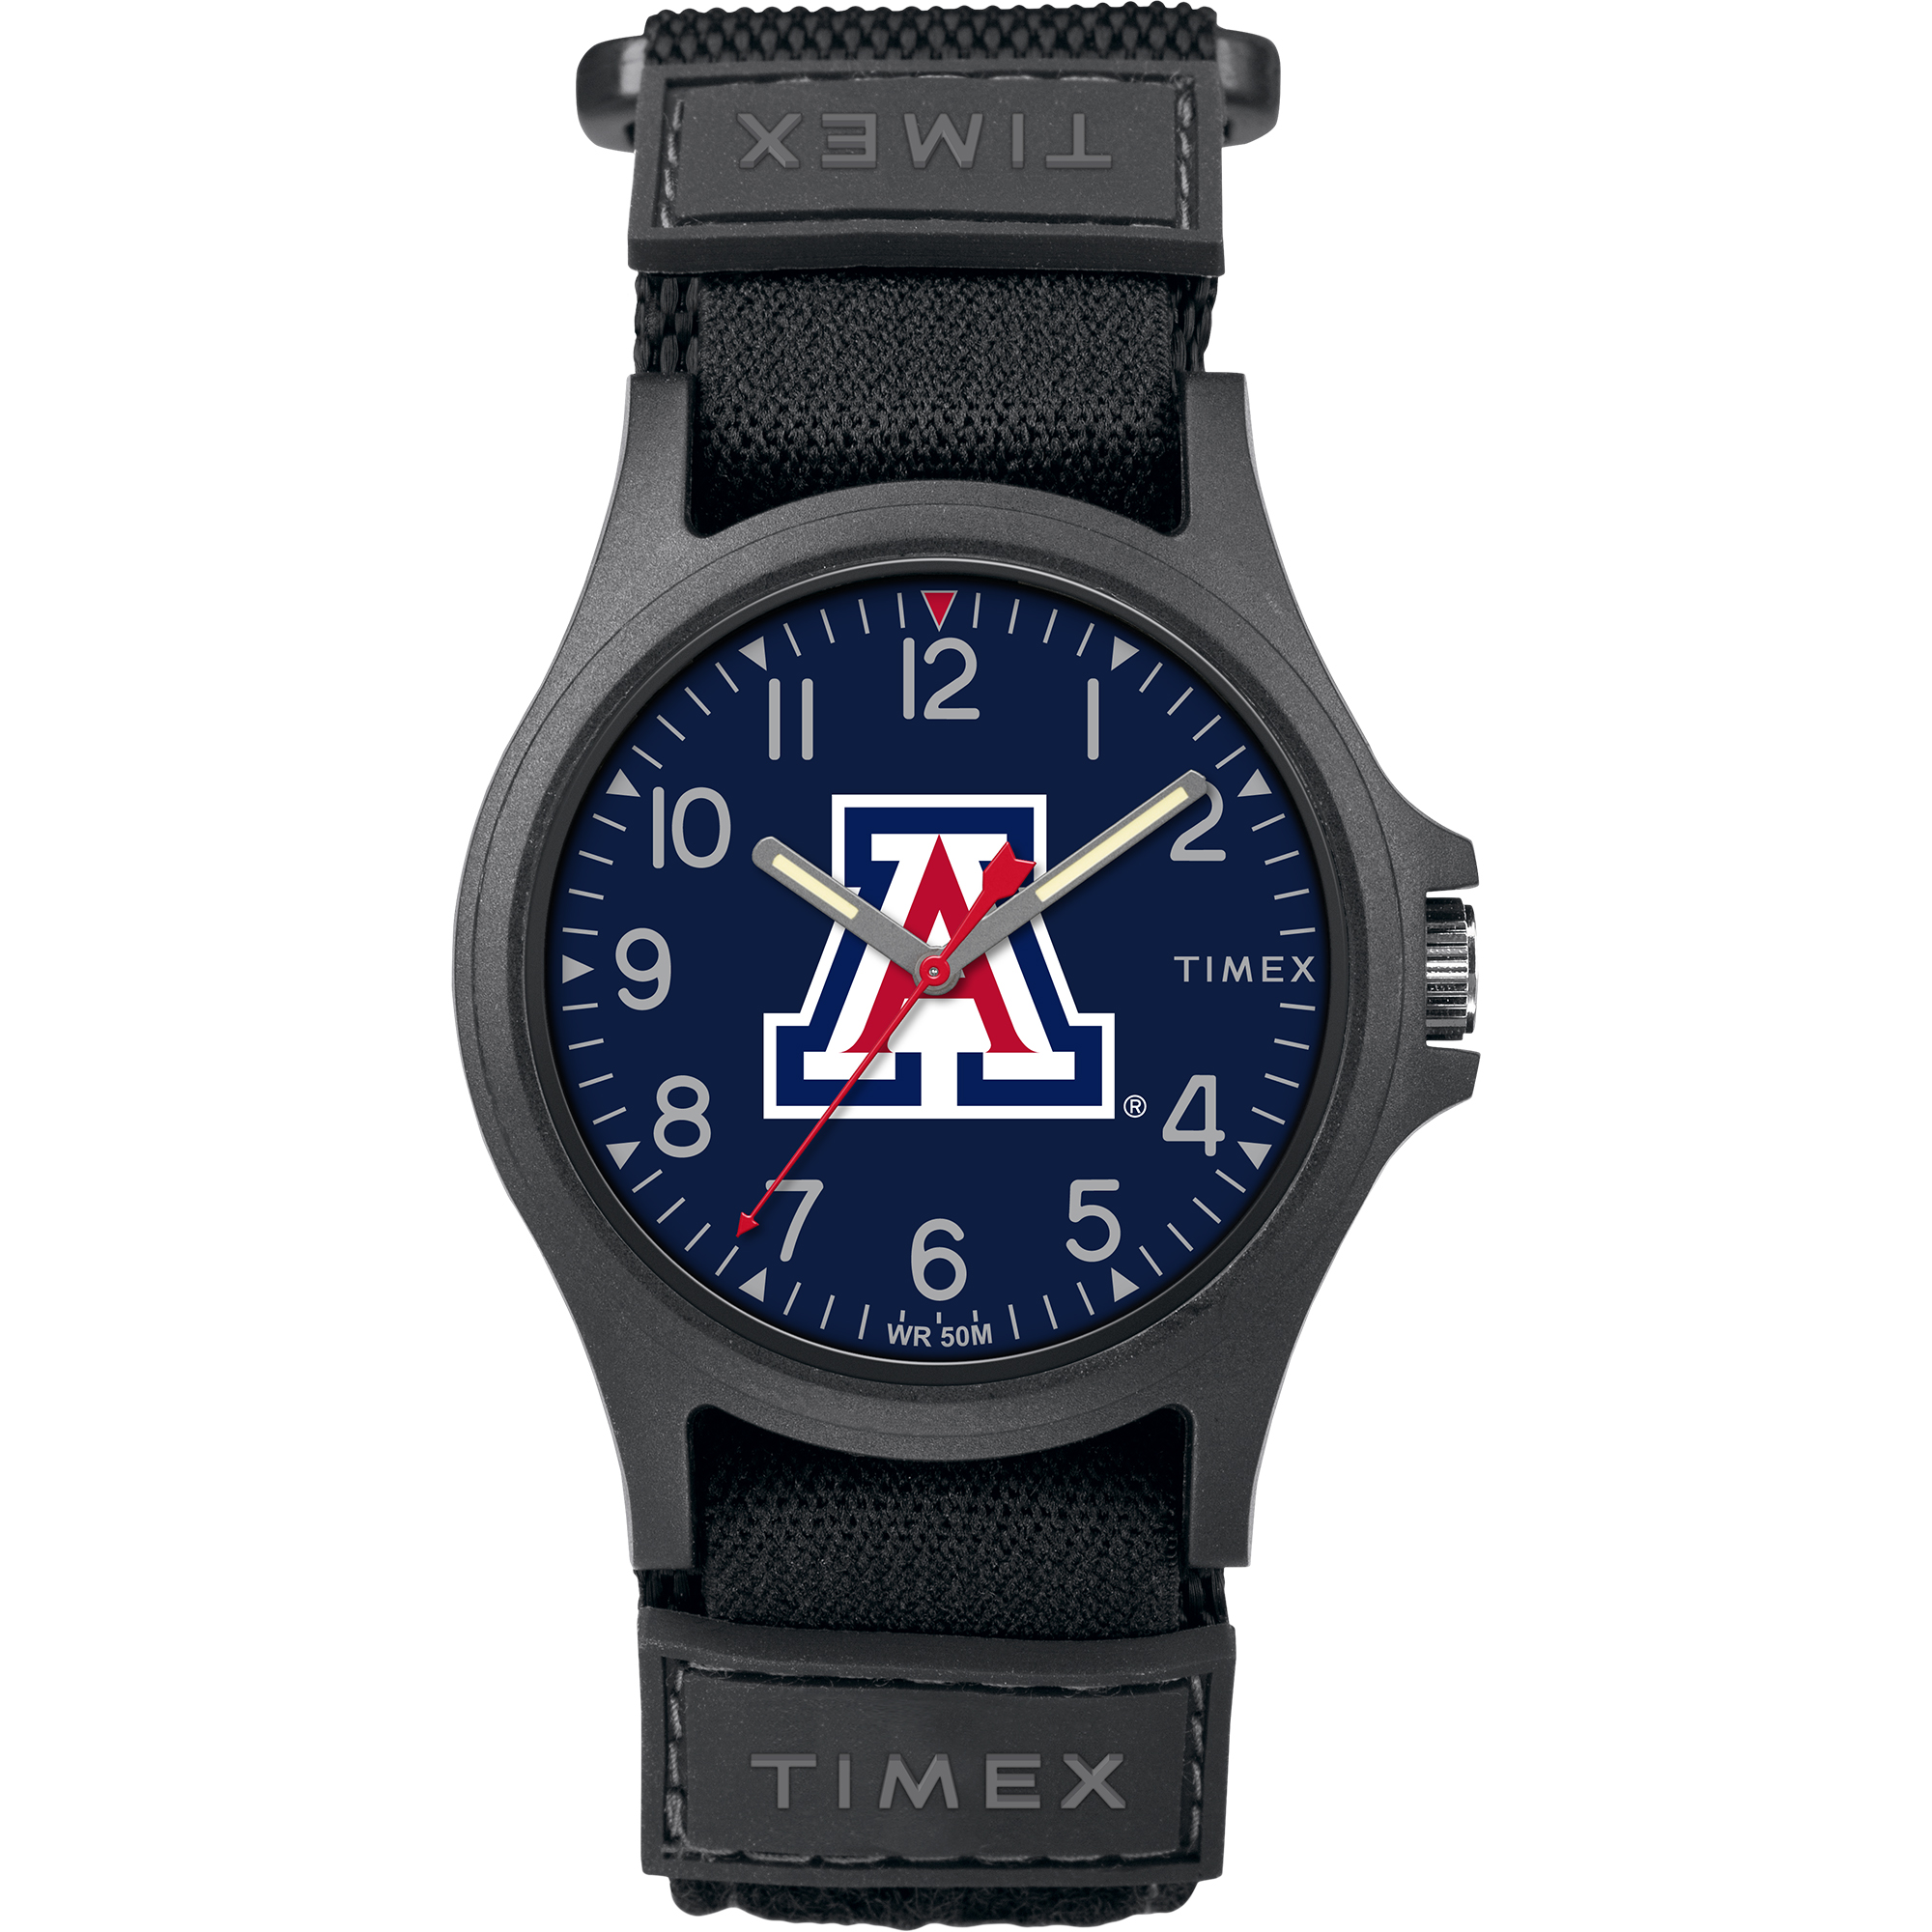 Timex - NCAA Tribute Collection Pride Men's Watch, University of Arizona Wildcats